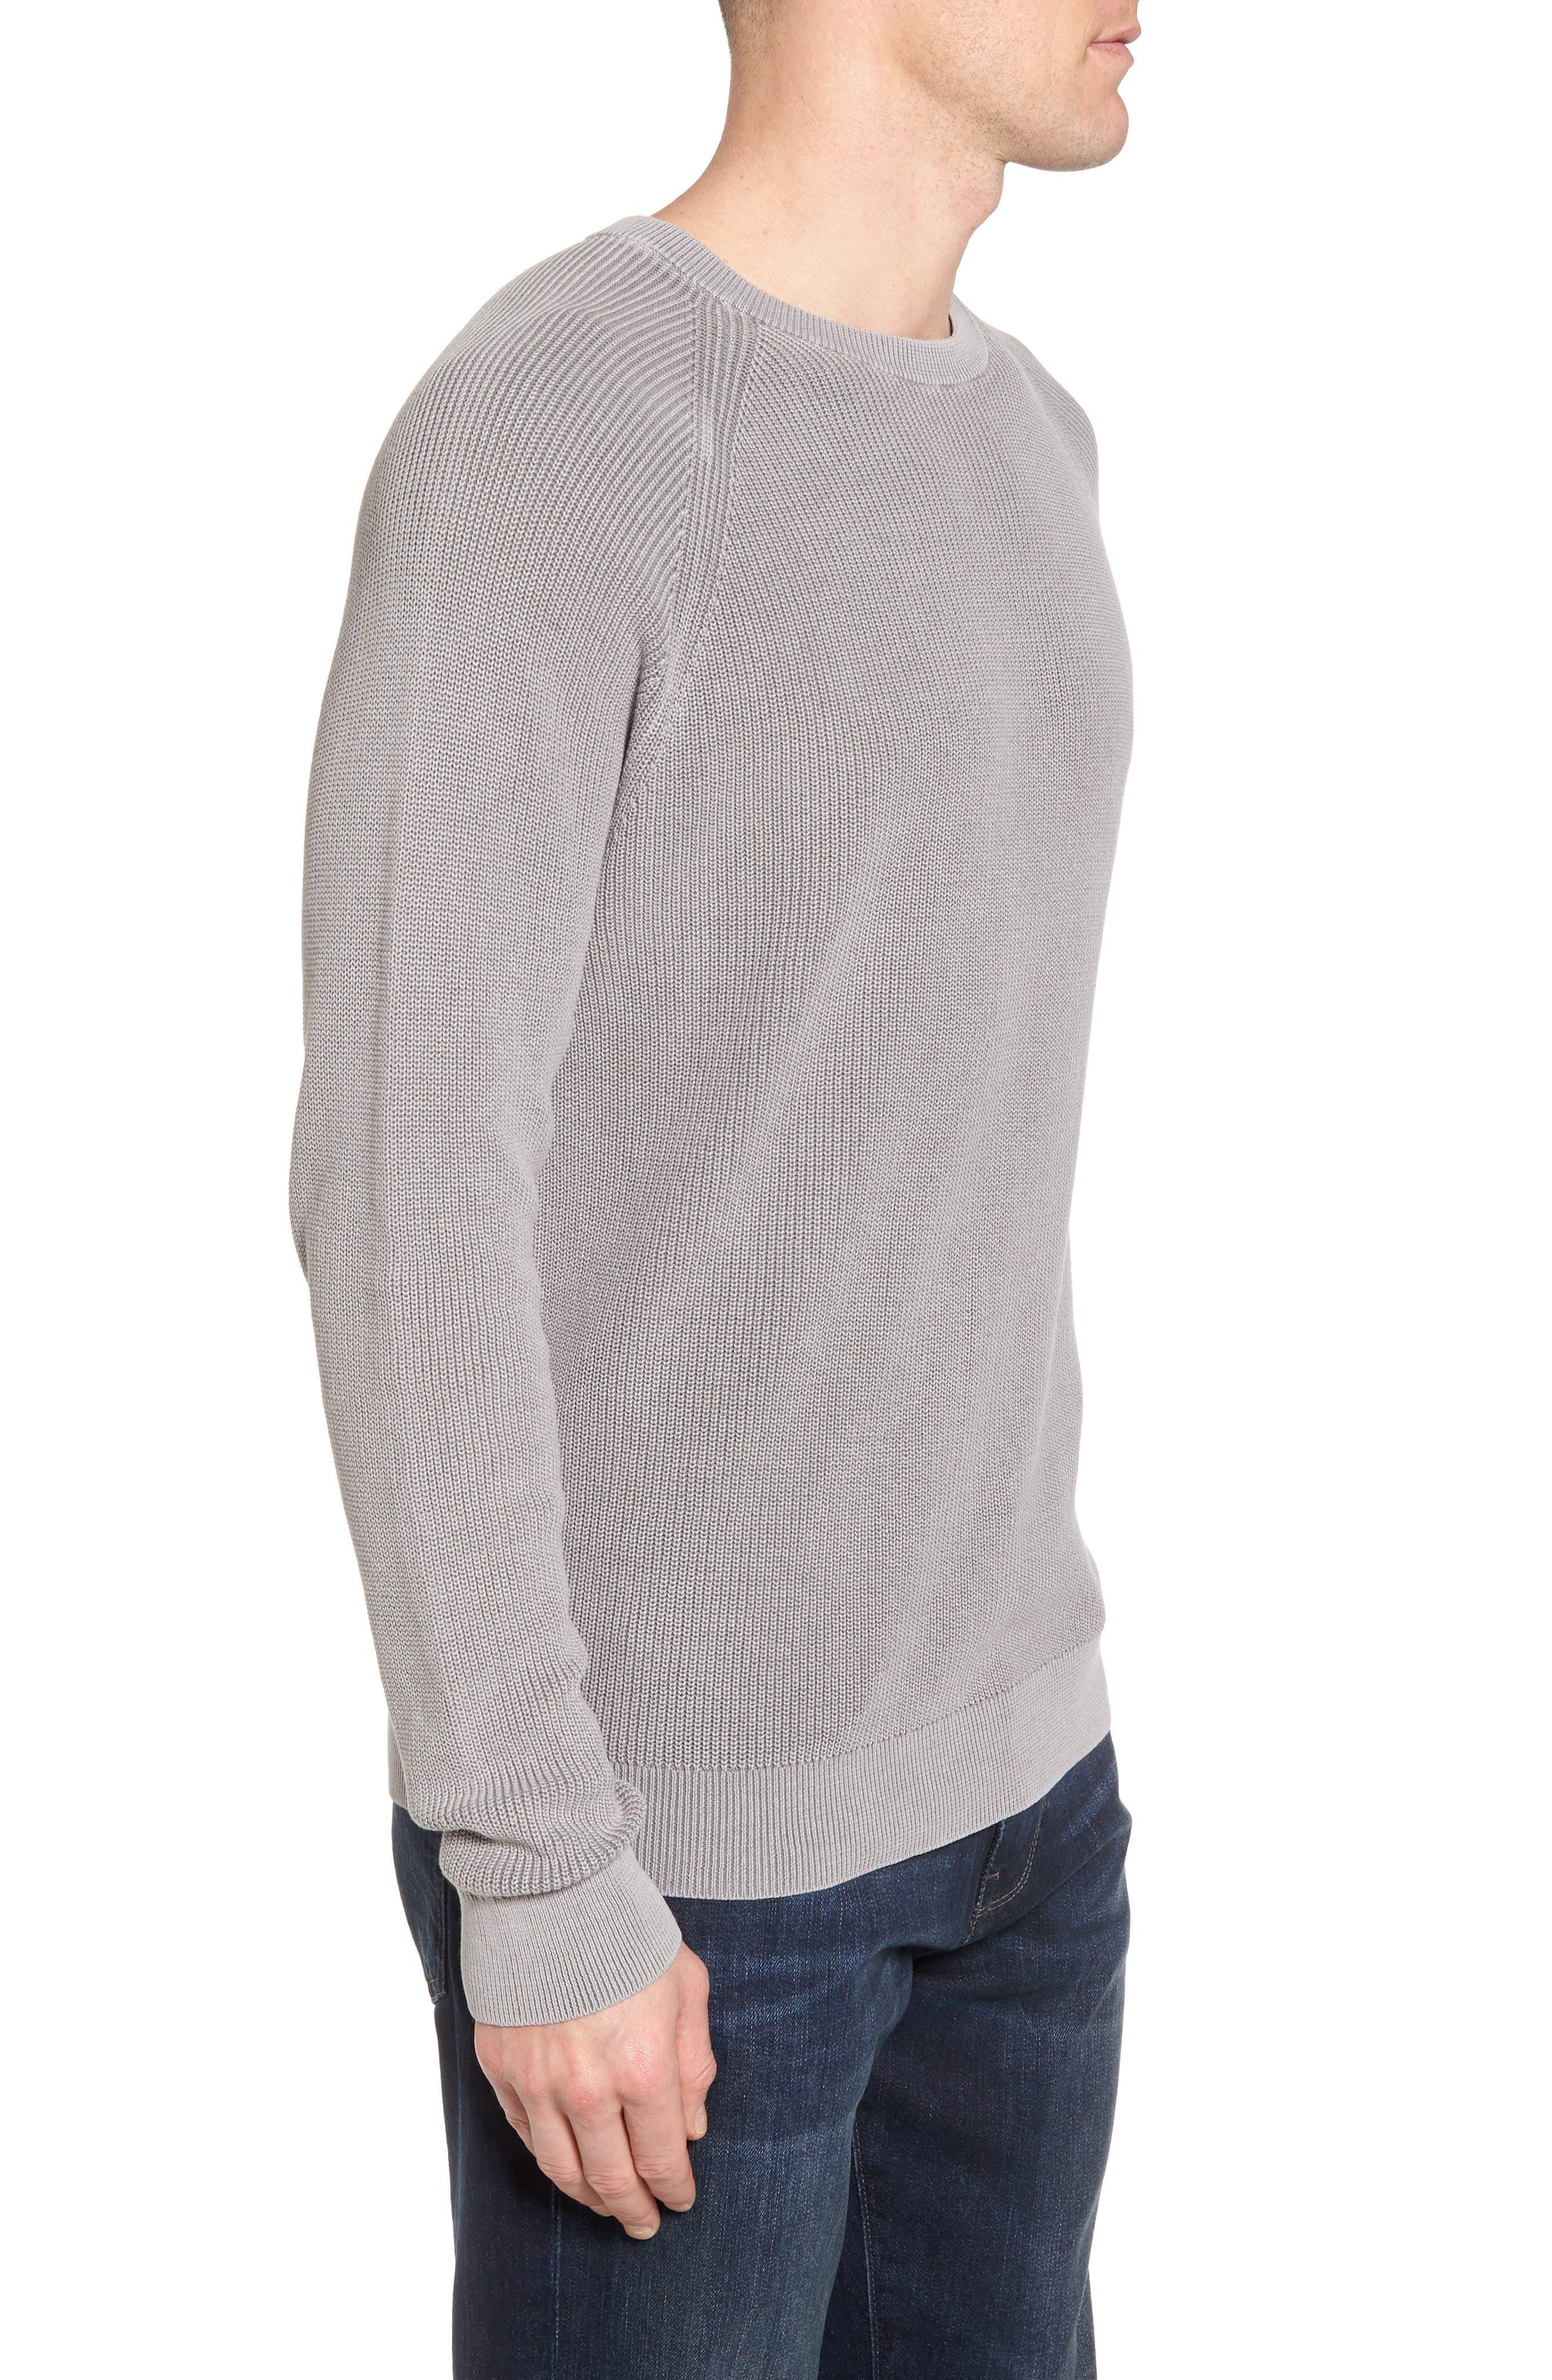 Crewneck Sweater,                             Alternate thumbnail 3, color,                             Grey Weather